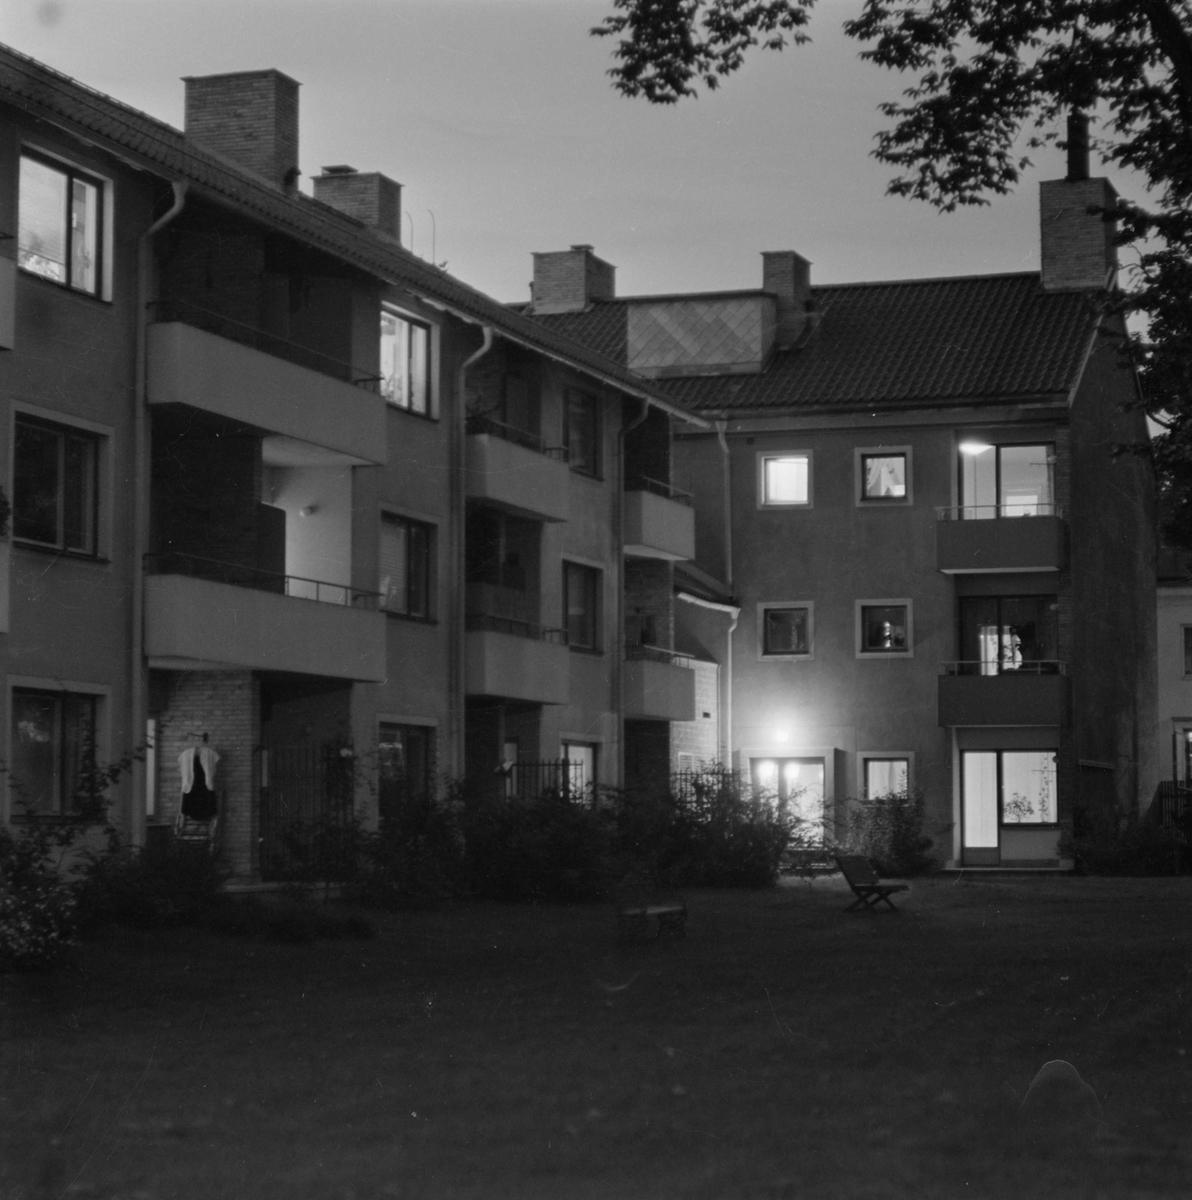 Flerfamiljshus, sannolikt Uppsala